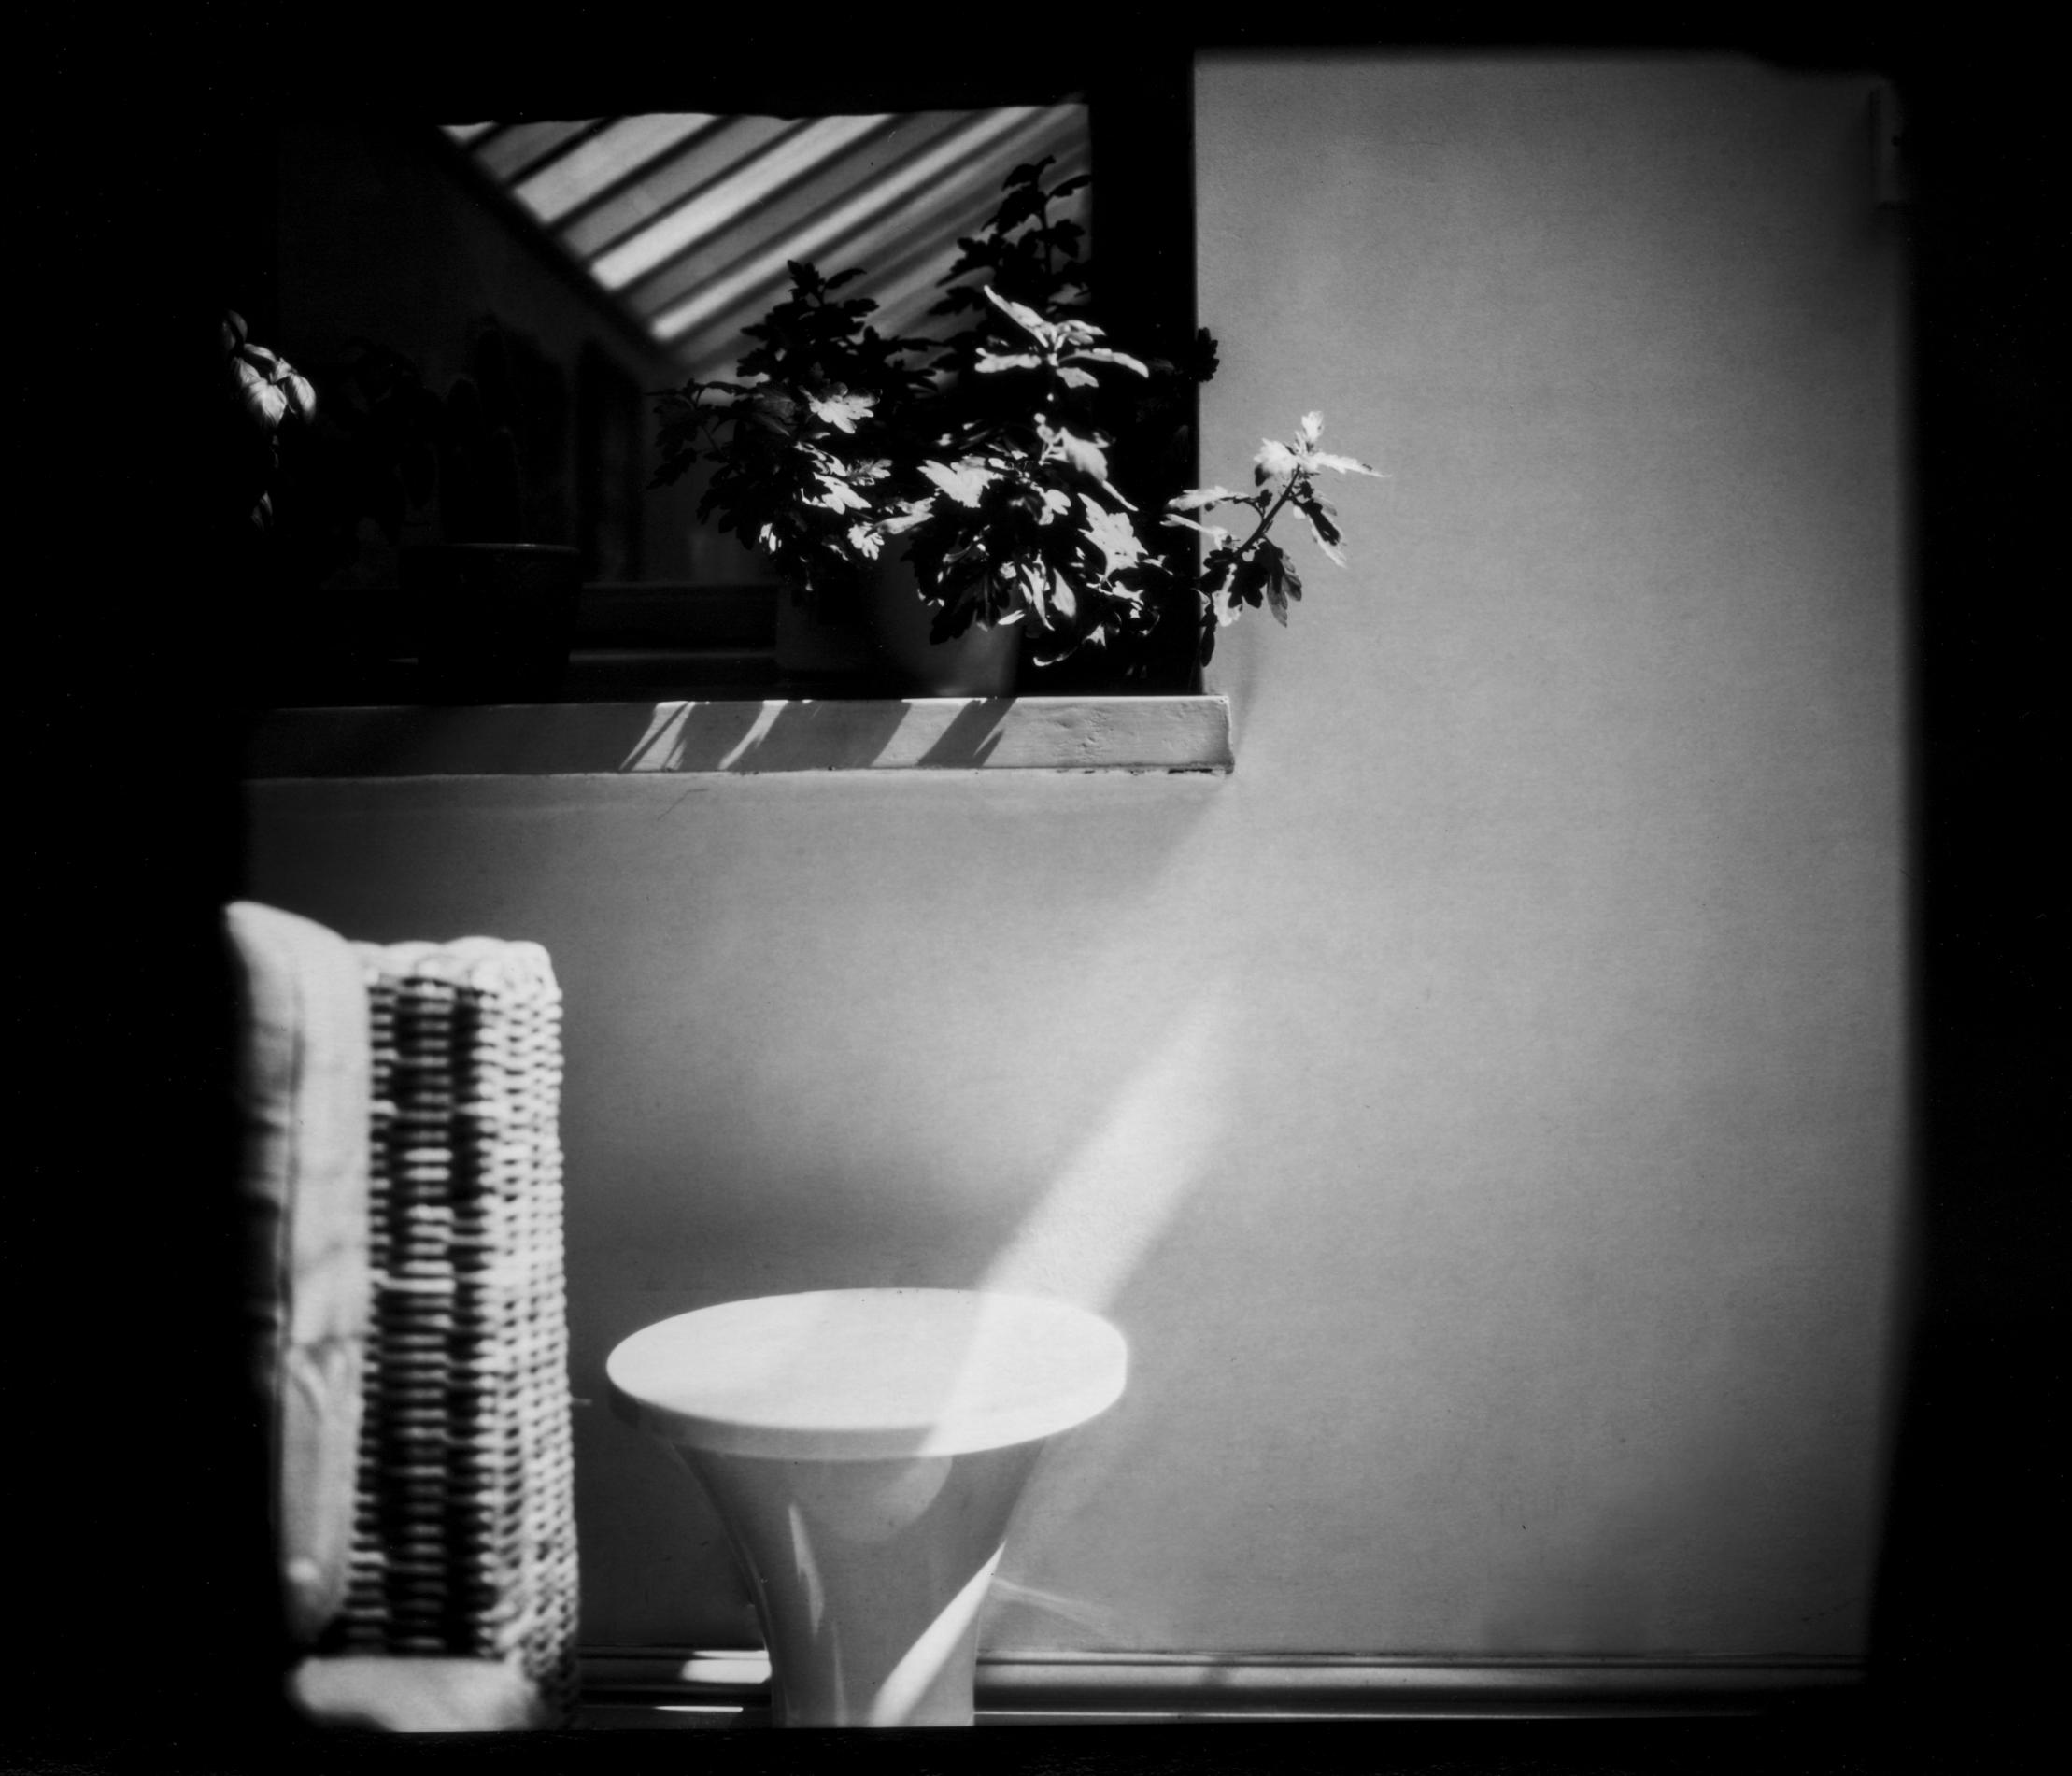 08 stool.jpg